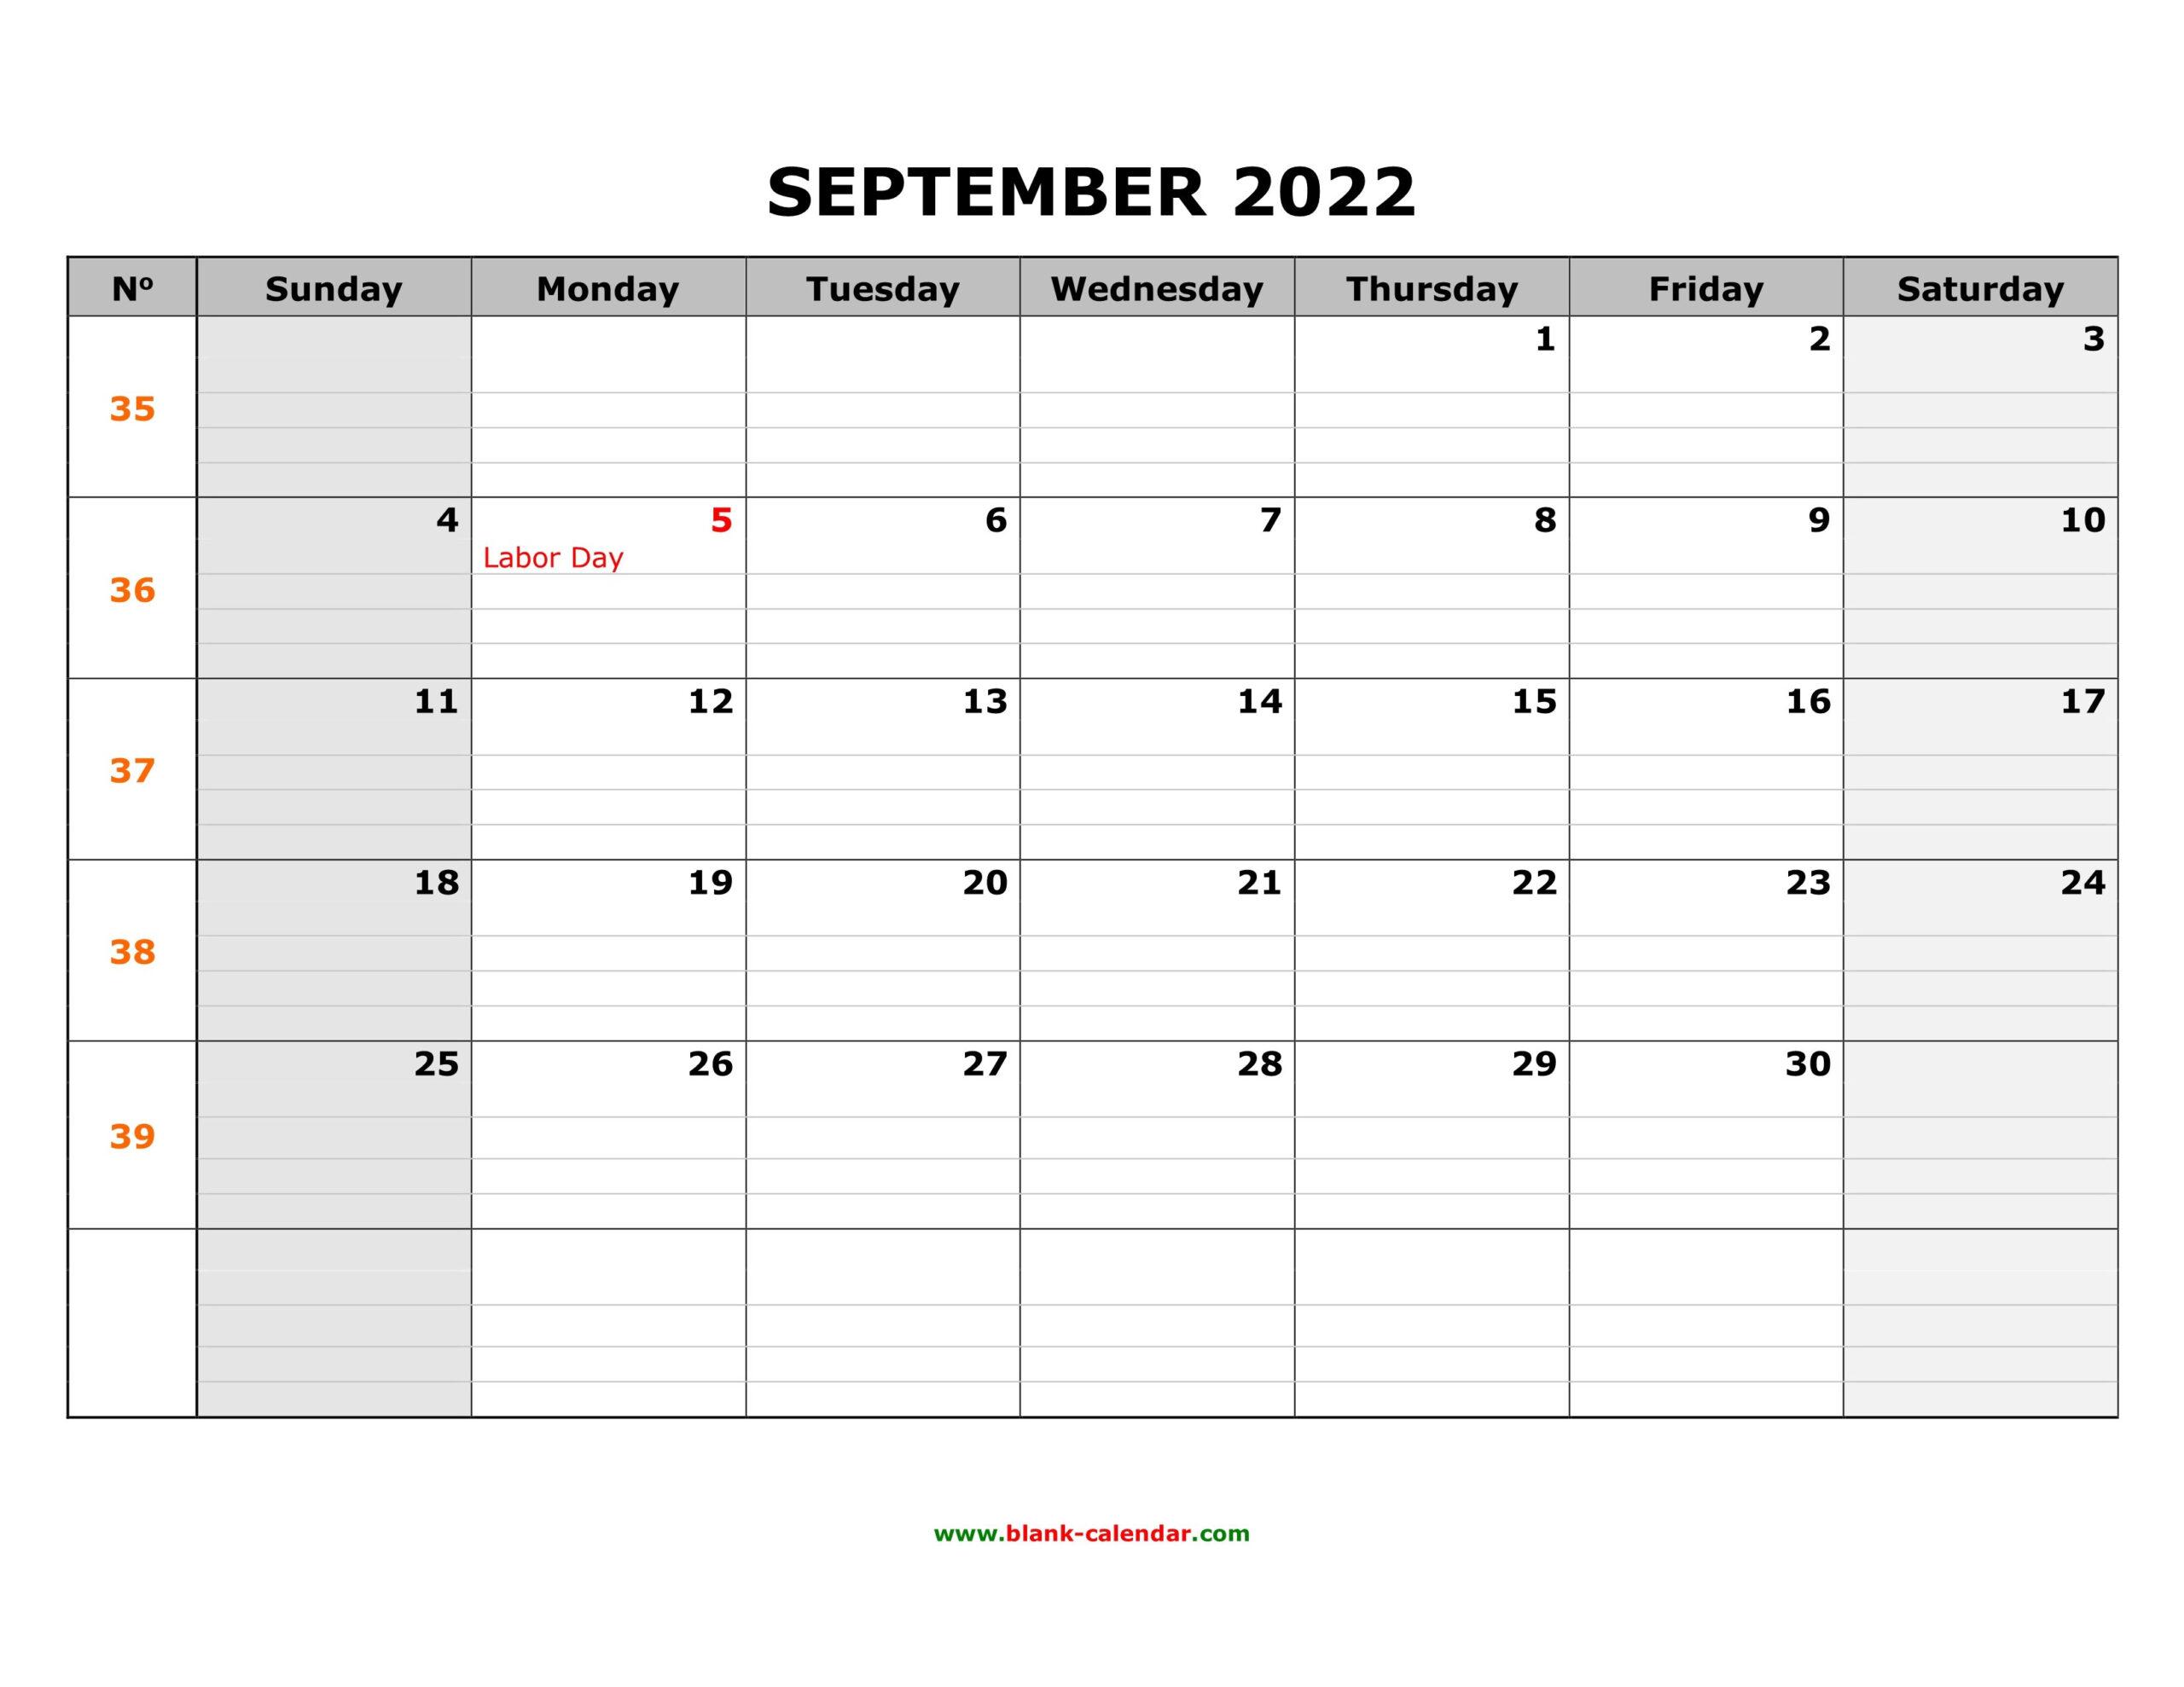 Free Download Printable September 2022 Calendar, Large Box intended for September 2022 Calendar Template